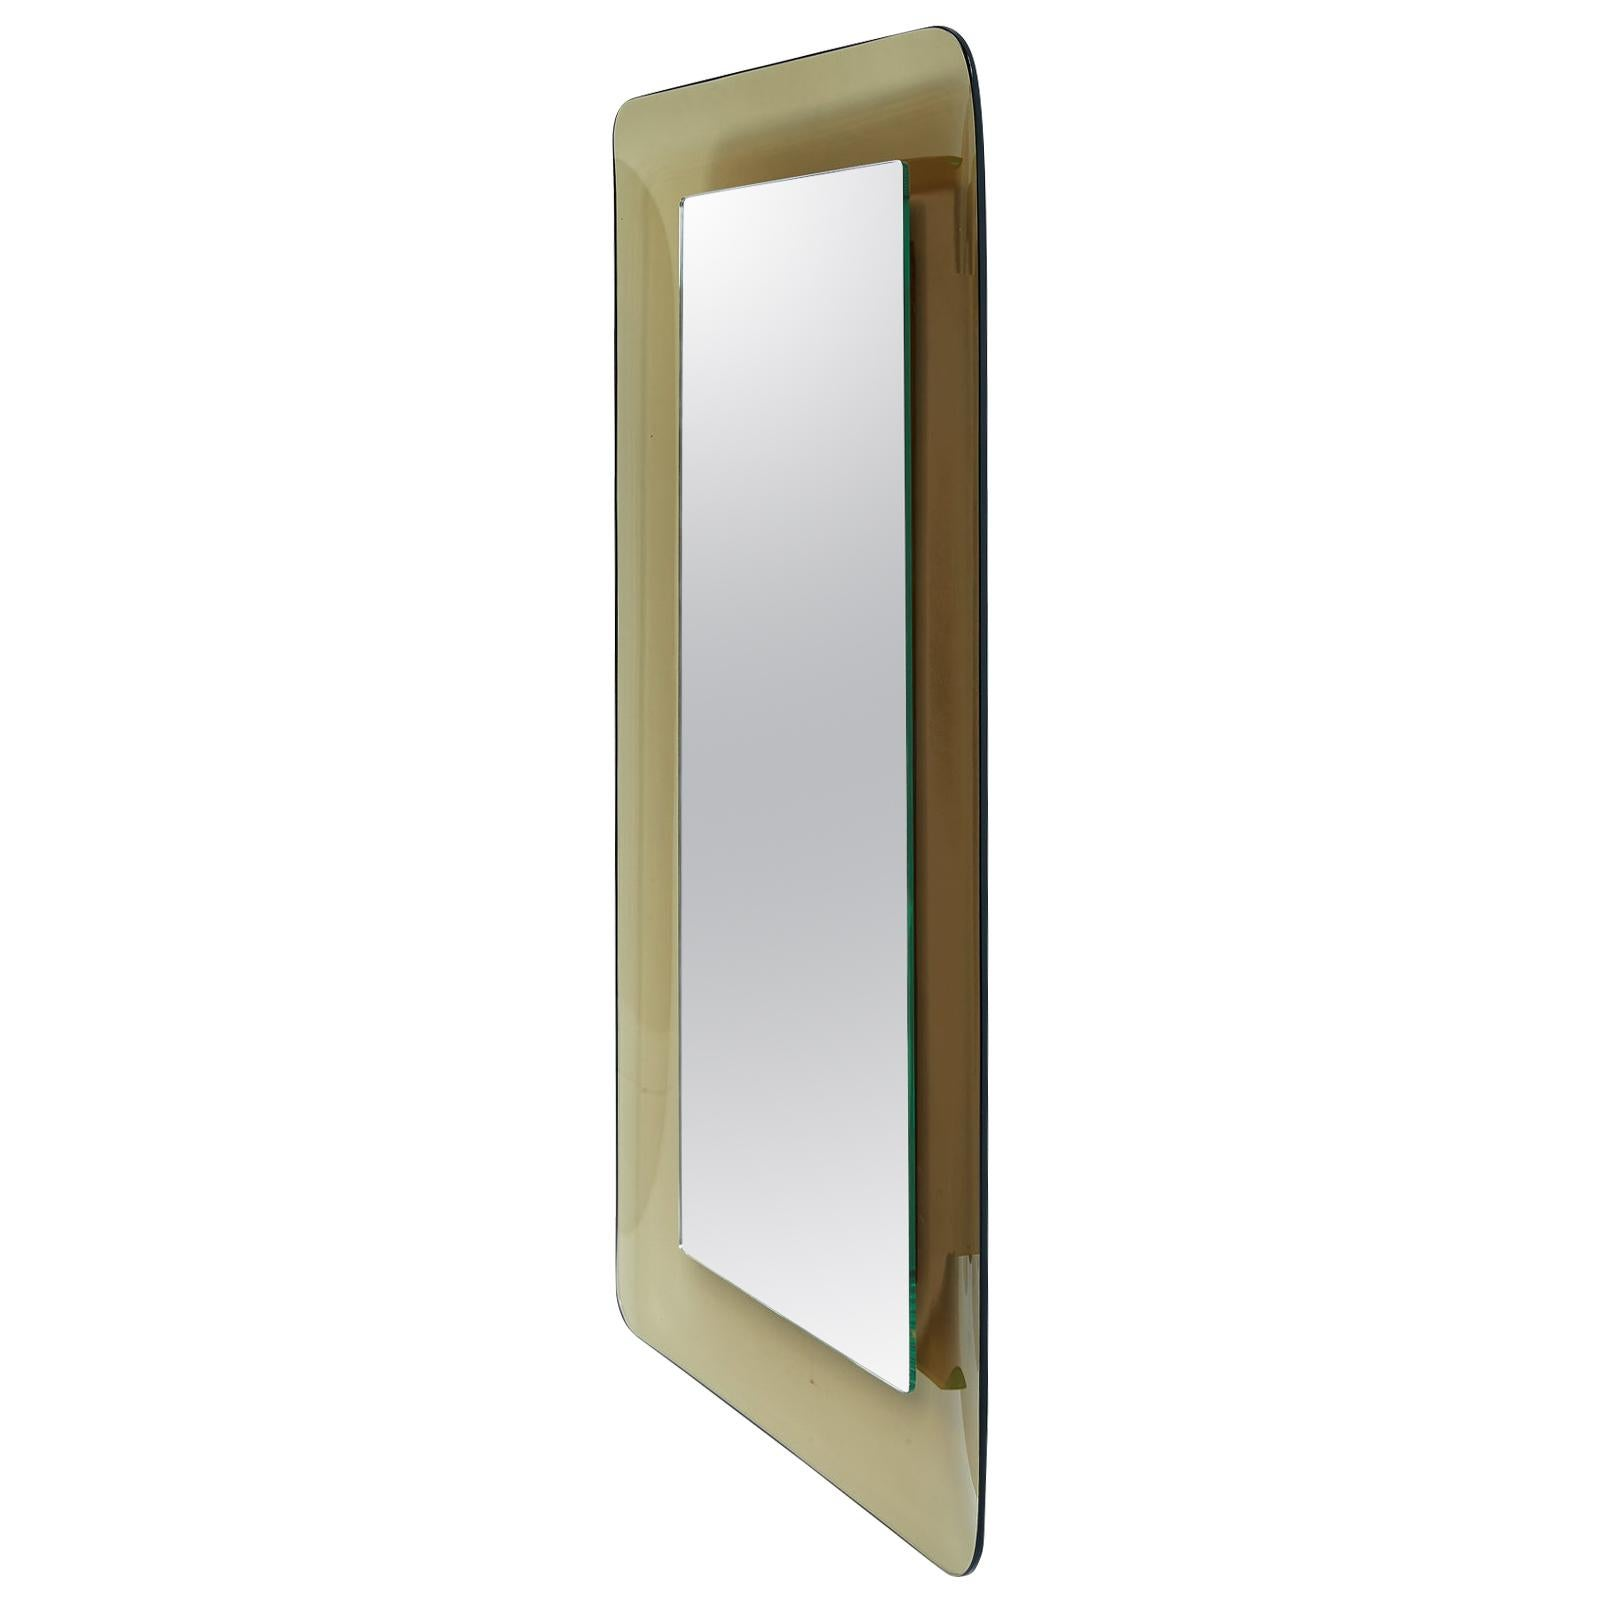 Fontana Arte, Max Ingrand Slender Smoked Glass Mirror